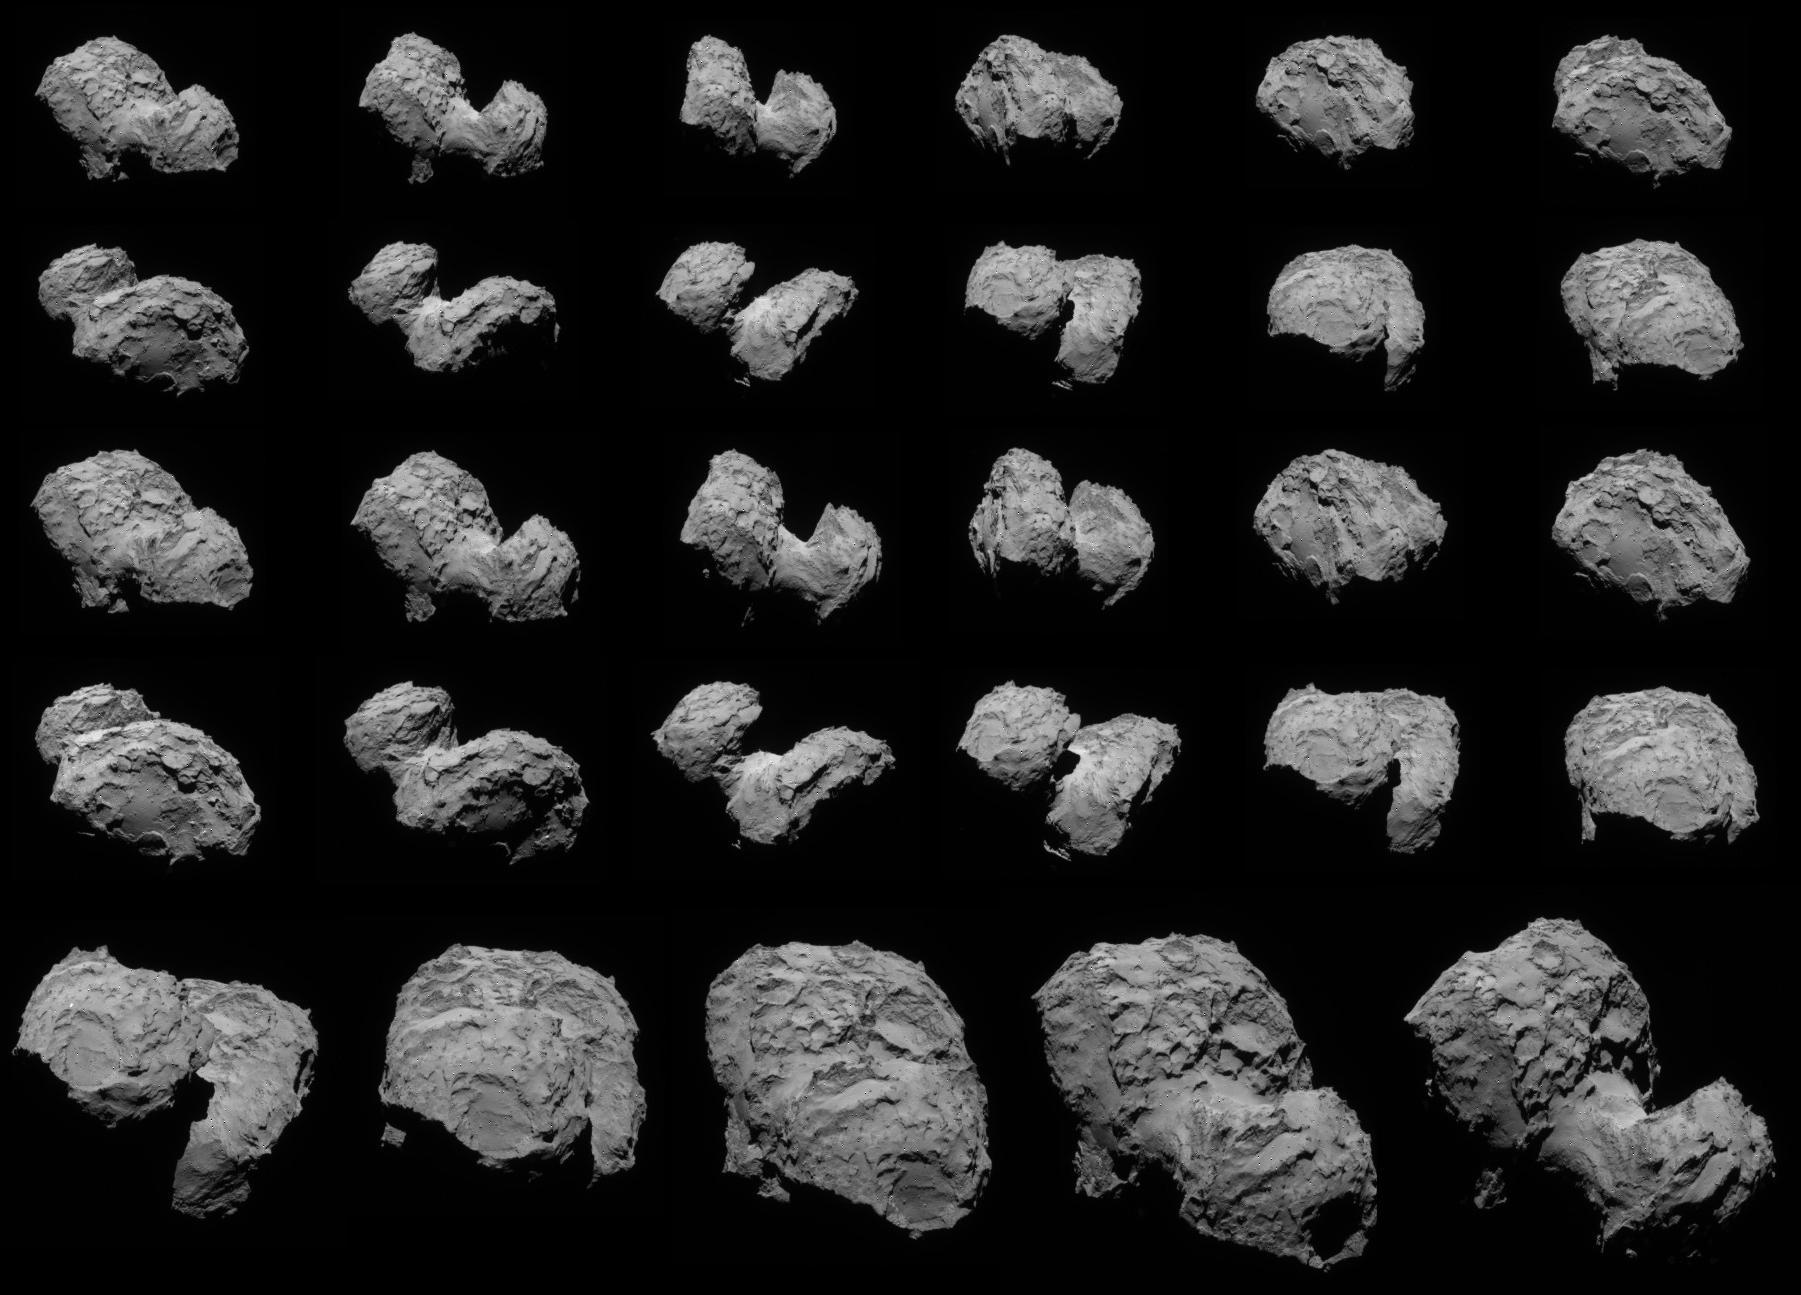 Rosetta : Mission autour de la comète 67P/Churyumov-Gerasimenko  - Page 2 5hnccb12